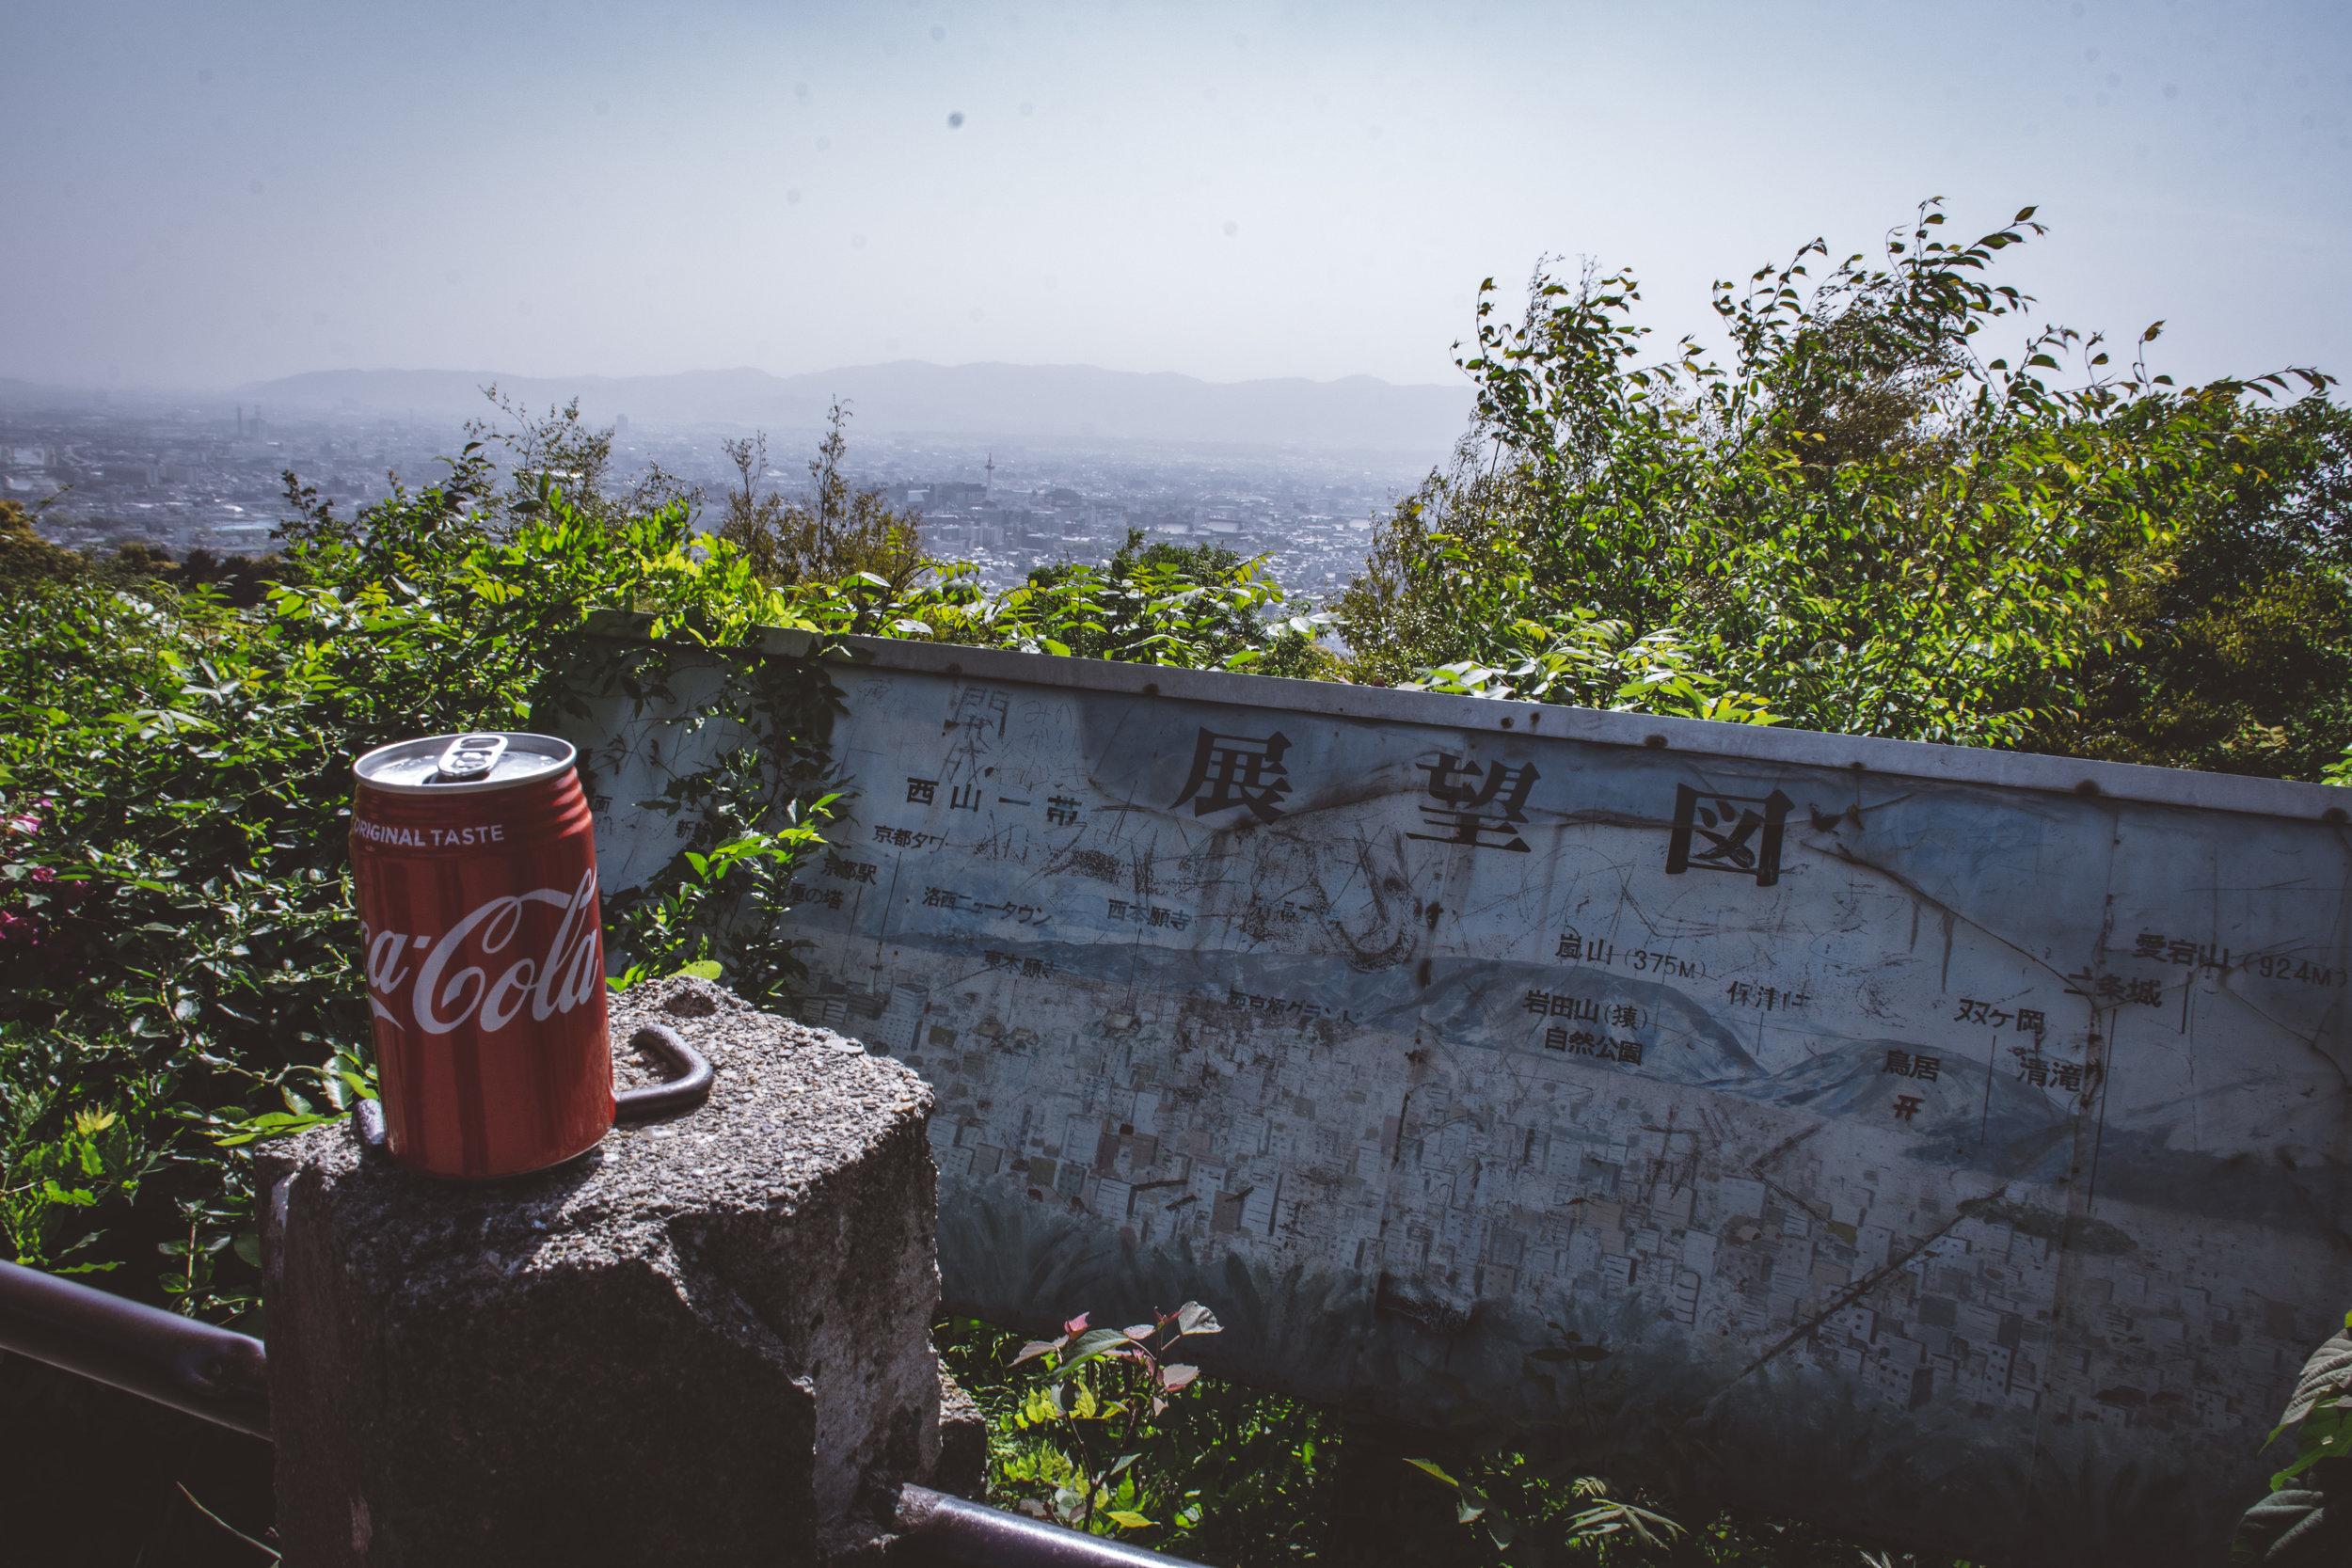 The actual viewpoint - The view from Higashiyama Sancho-koen